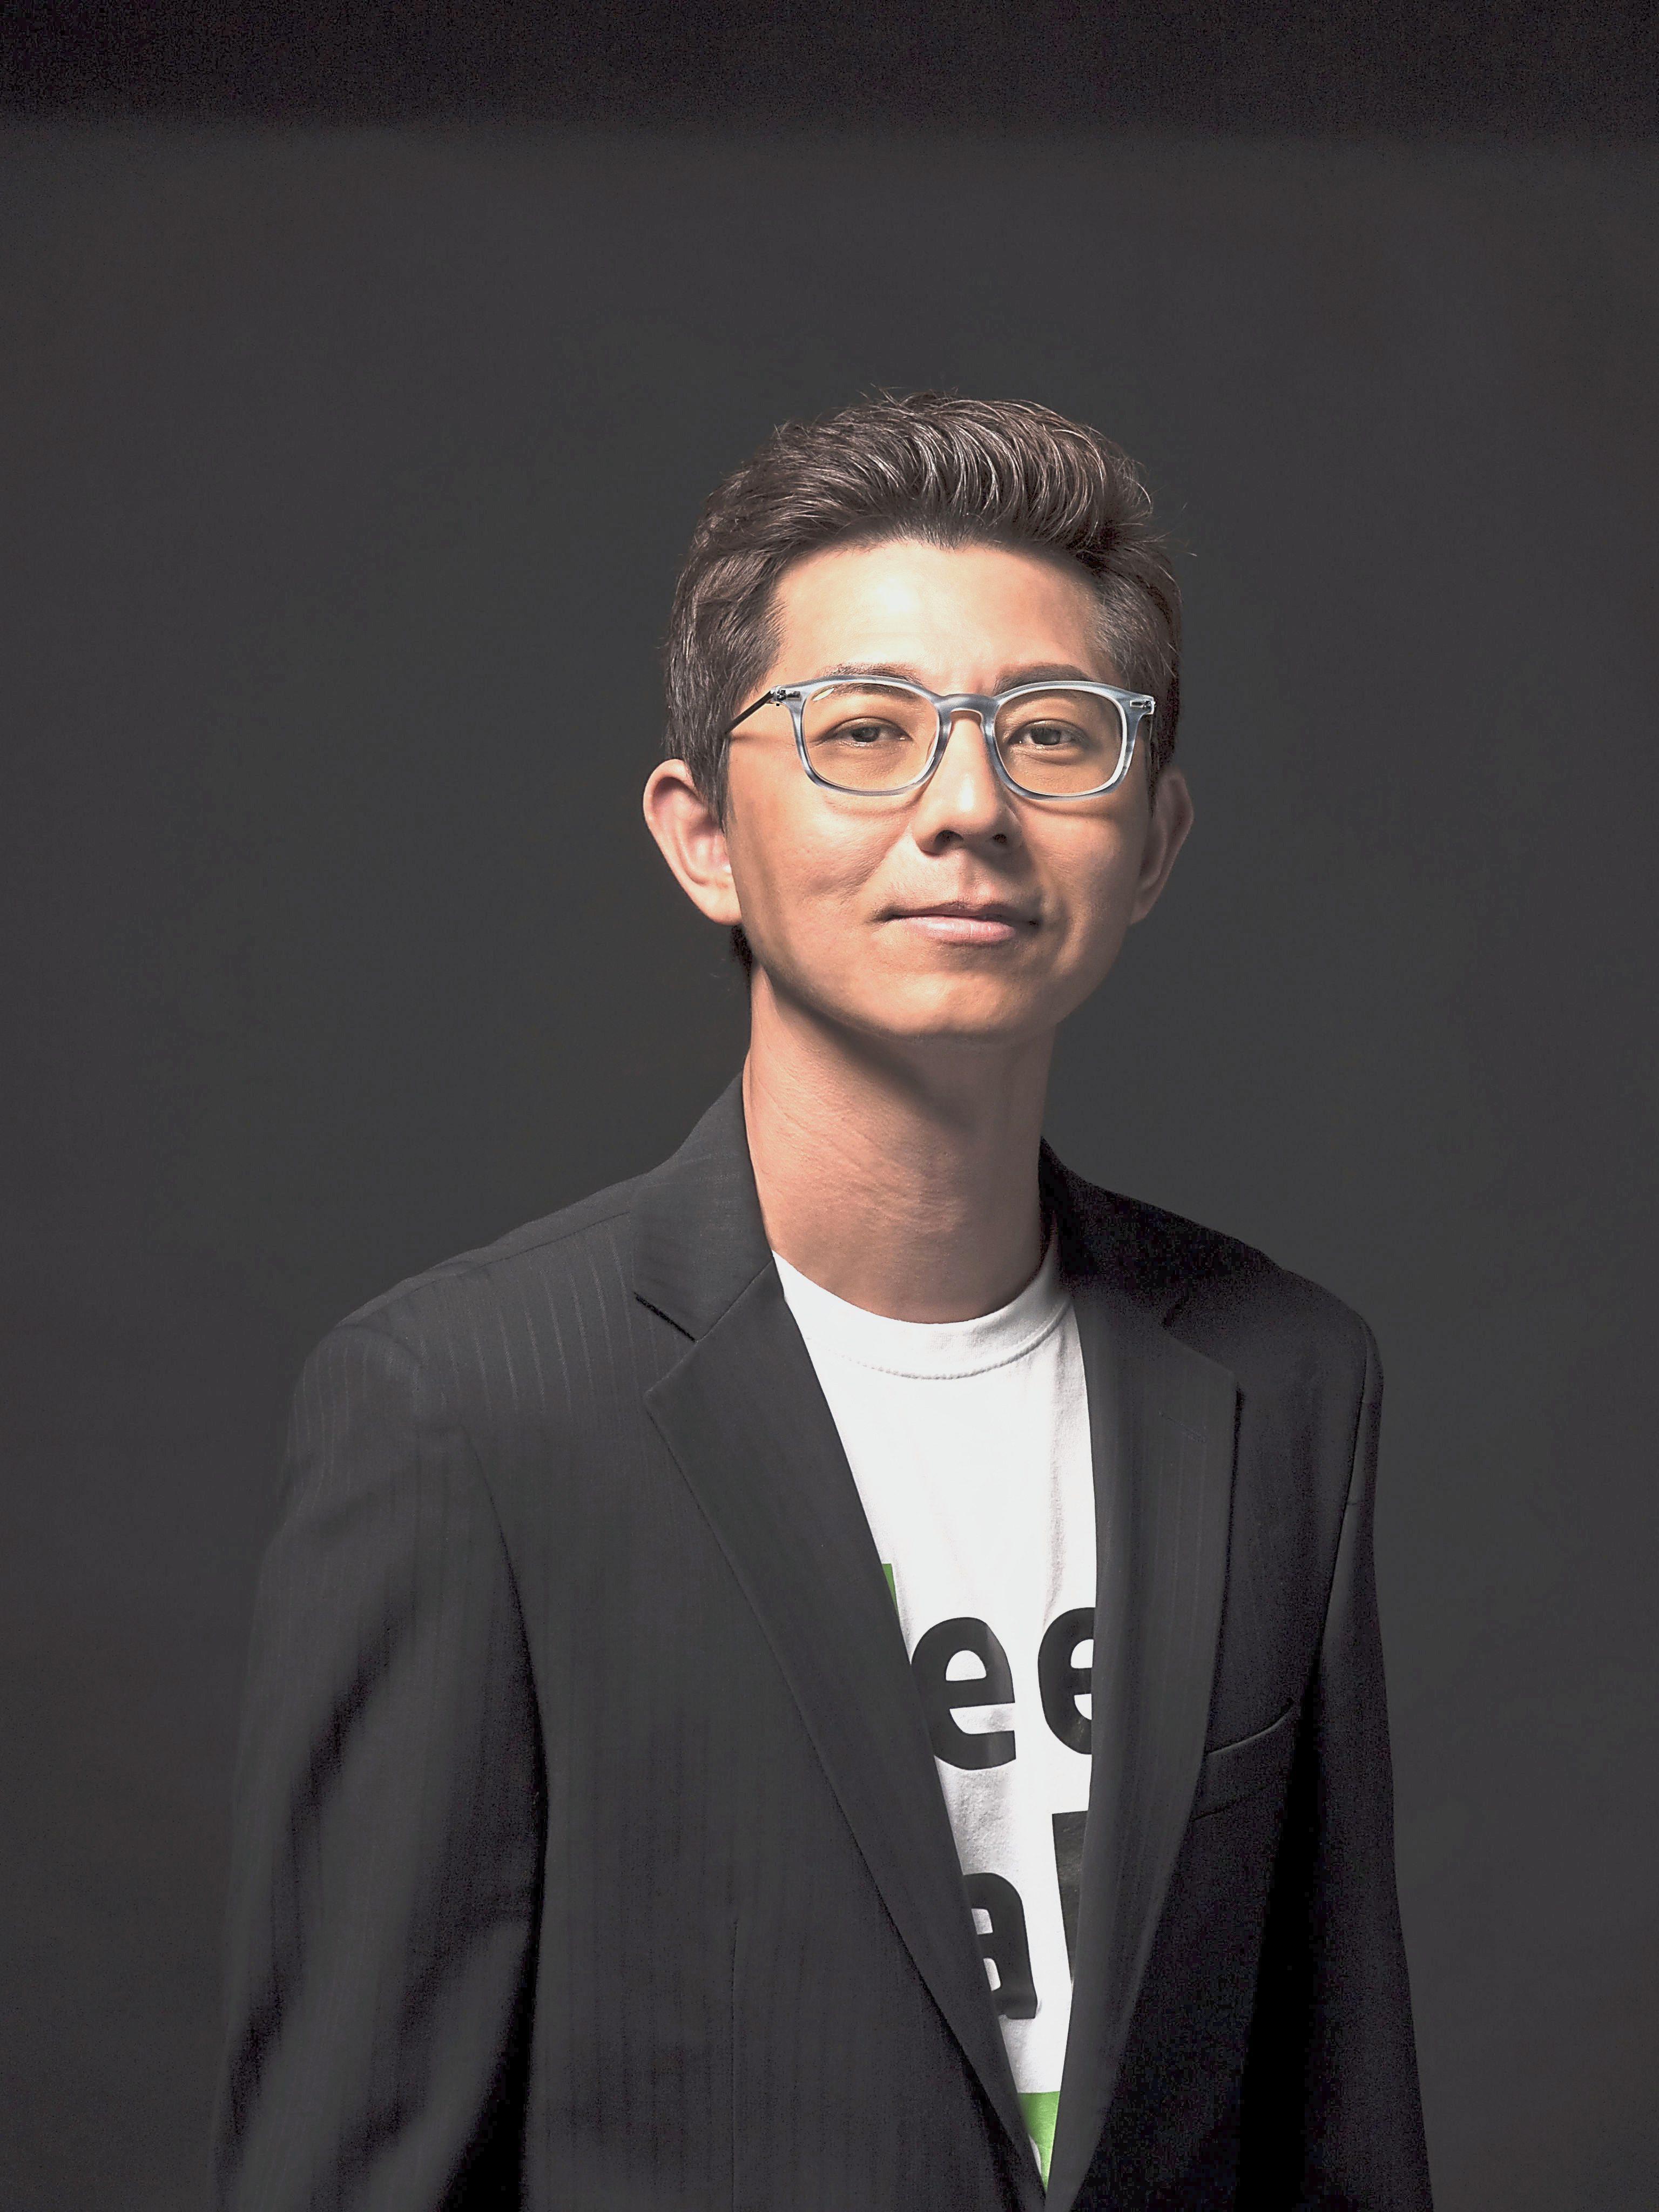 KCLau.com founder KC Lau